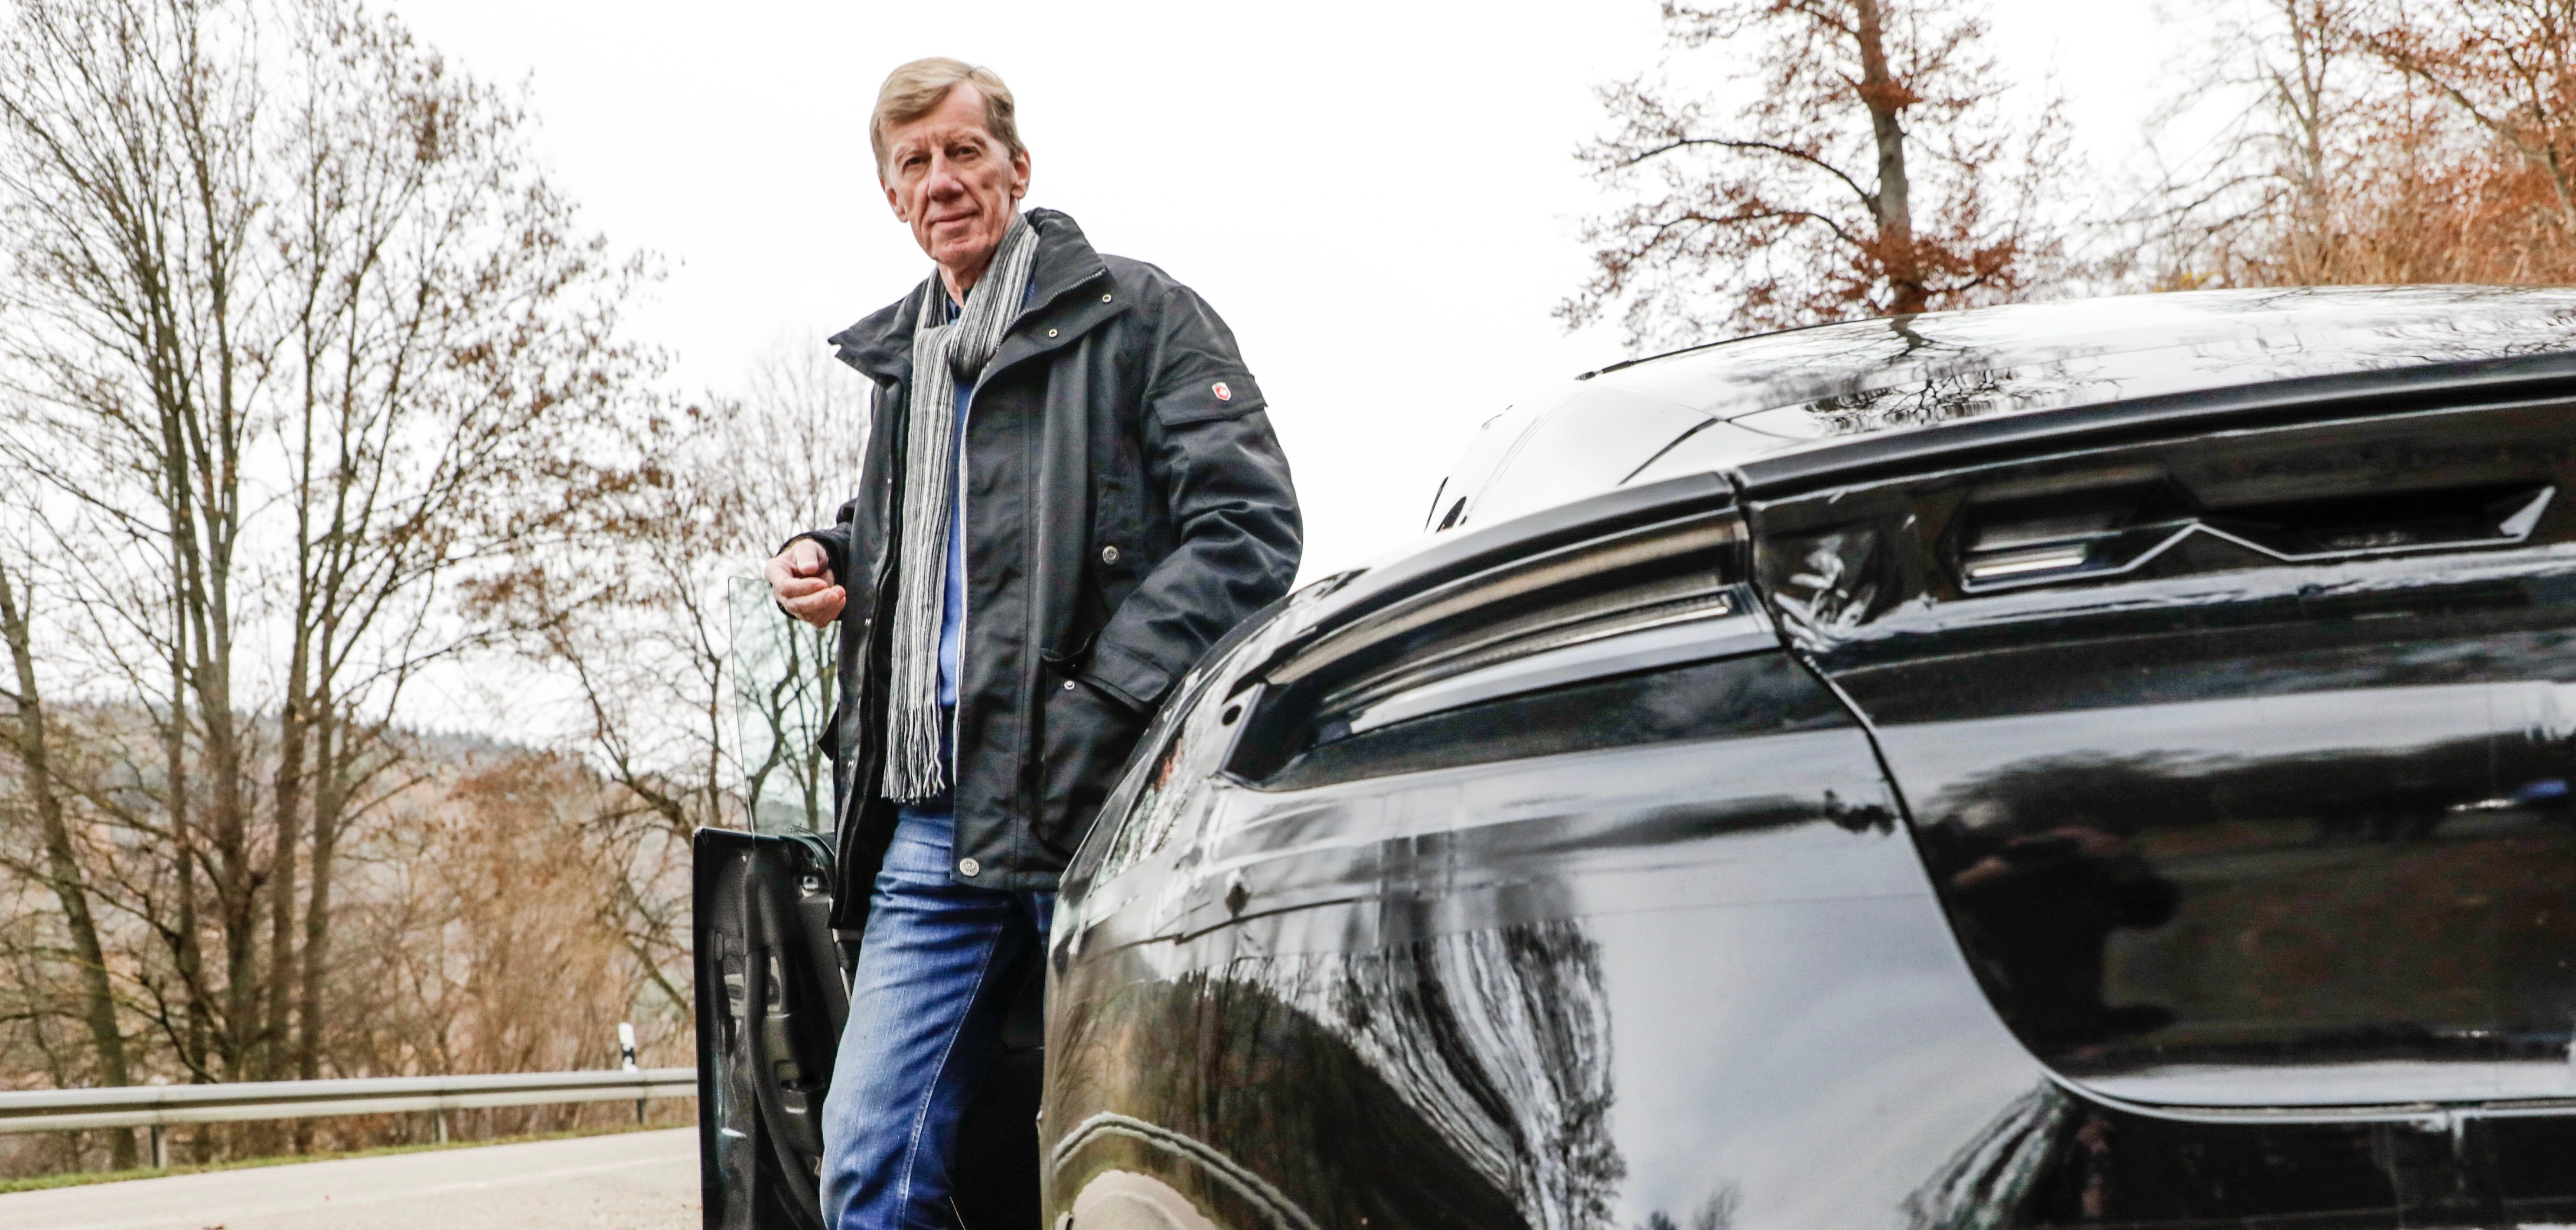 Porsche Taycan is put to the test by rally legend Walter Röhrl